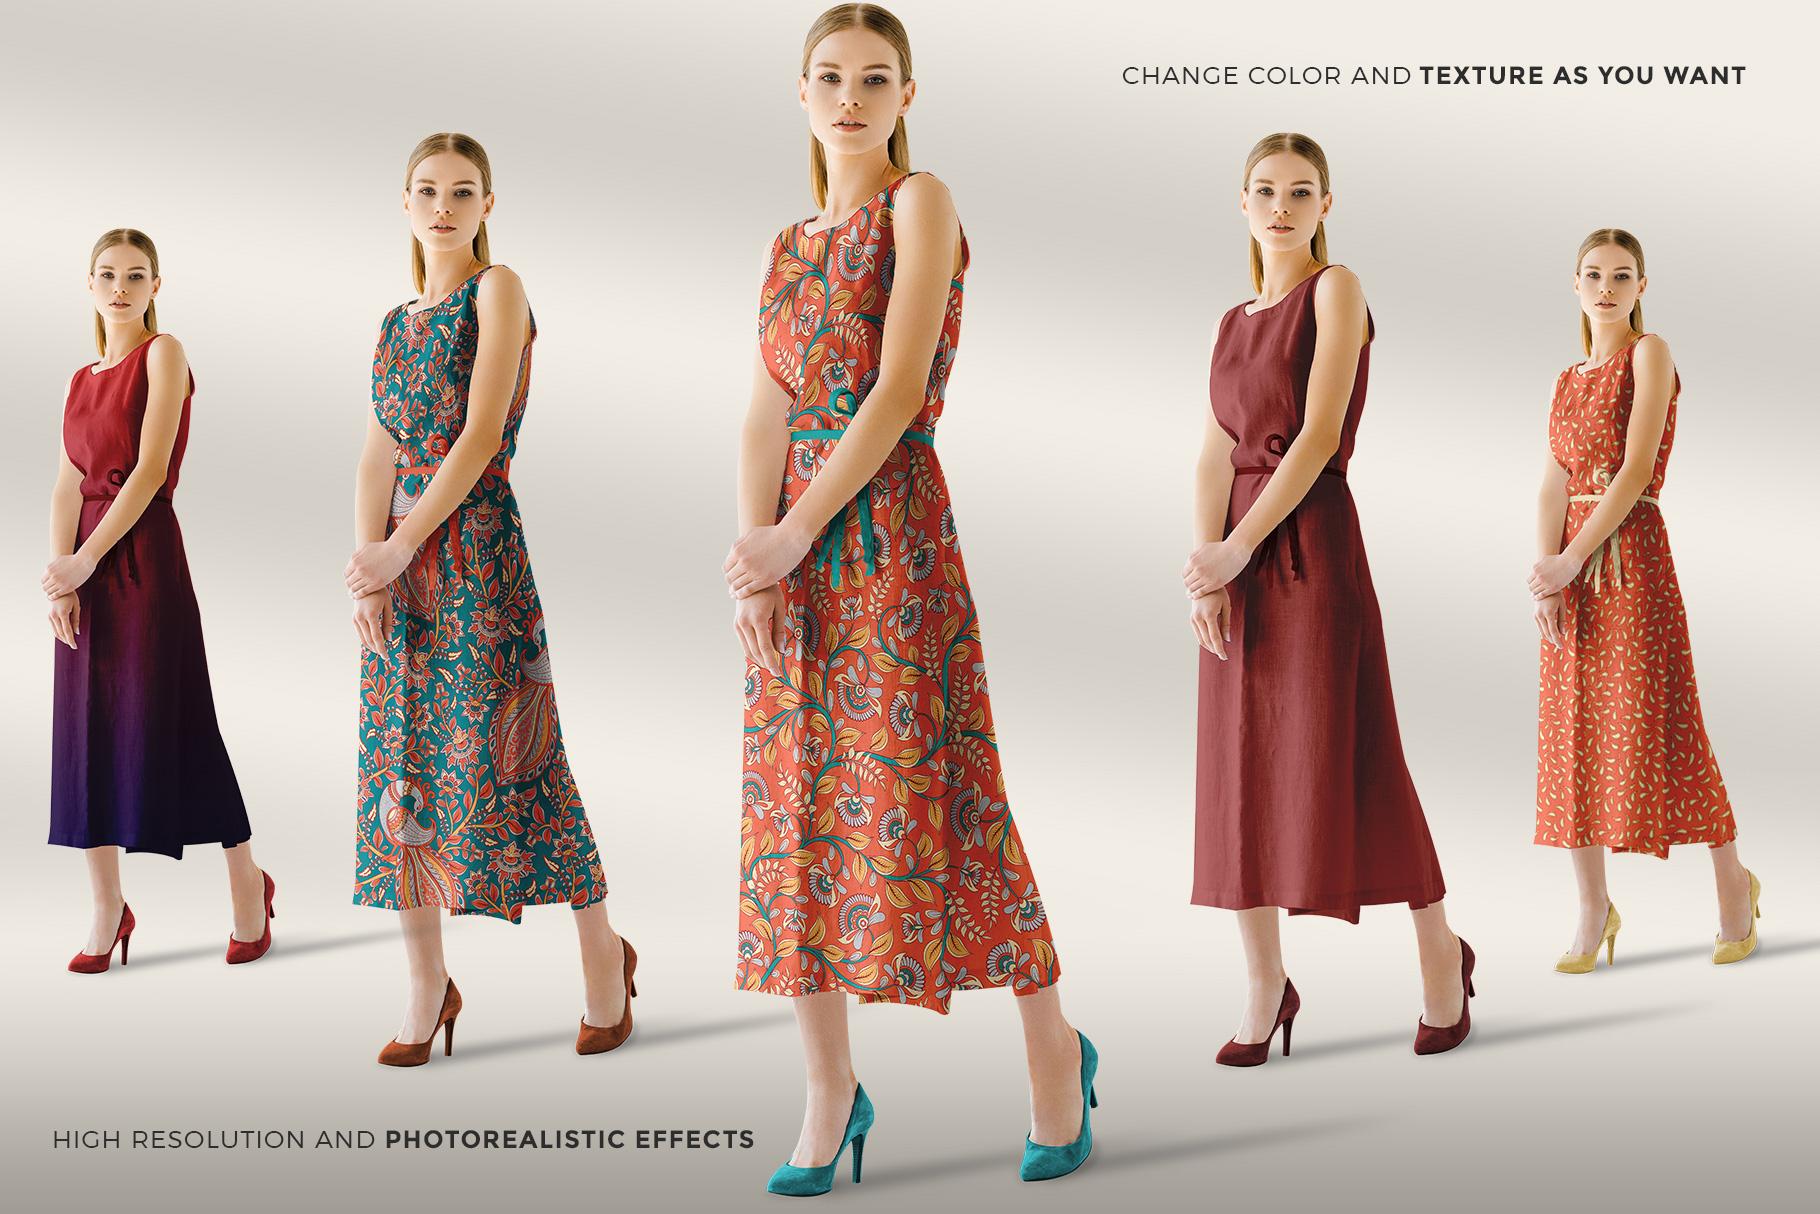 variations of the women's sleeveless summer dress mockup vol.2